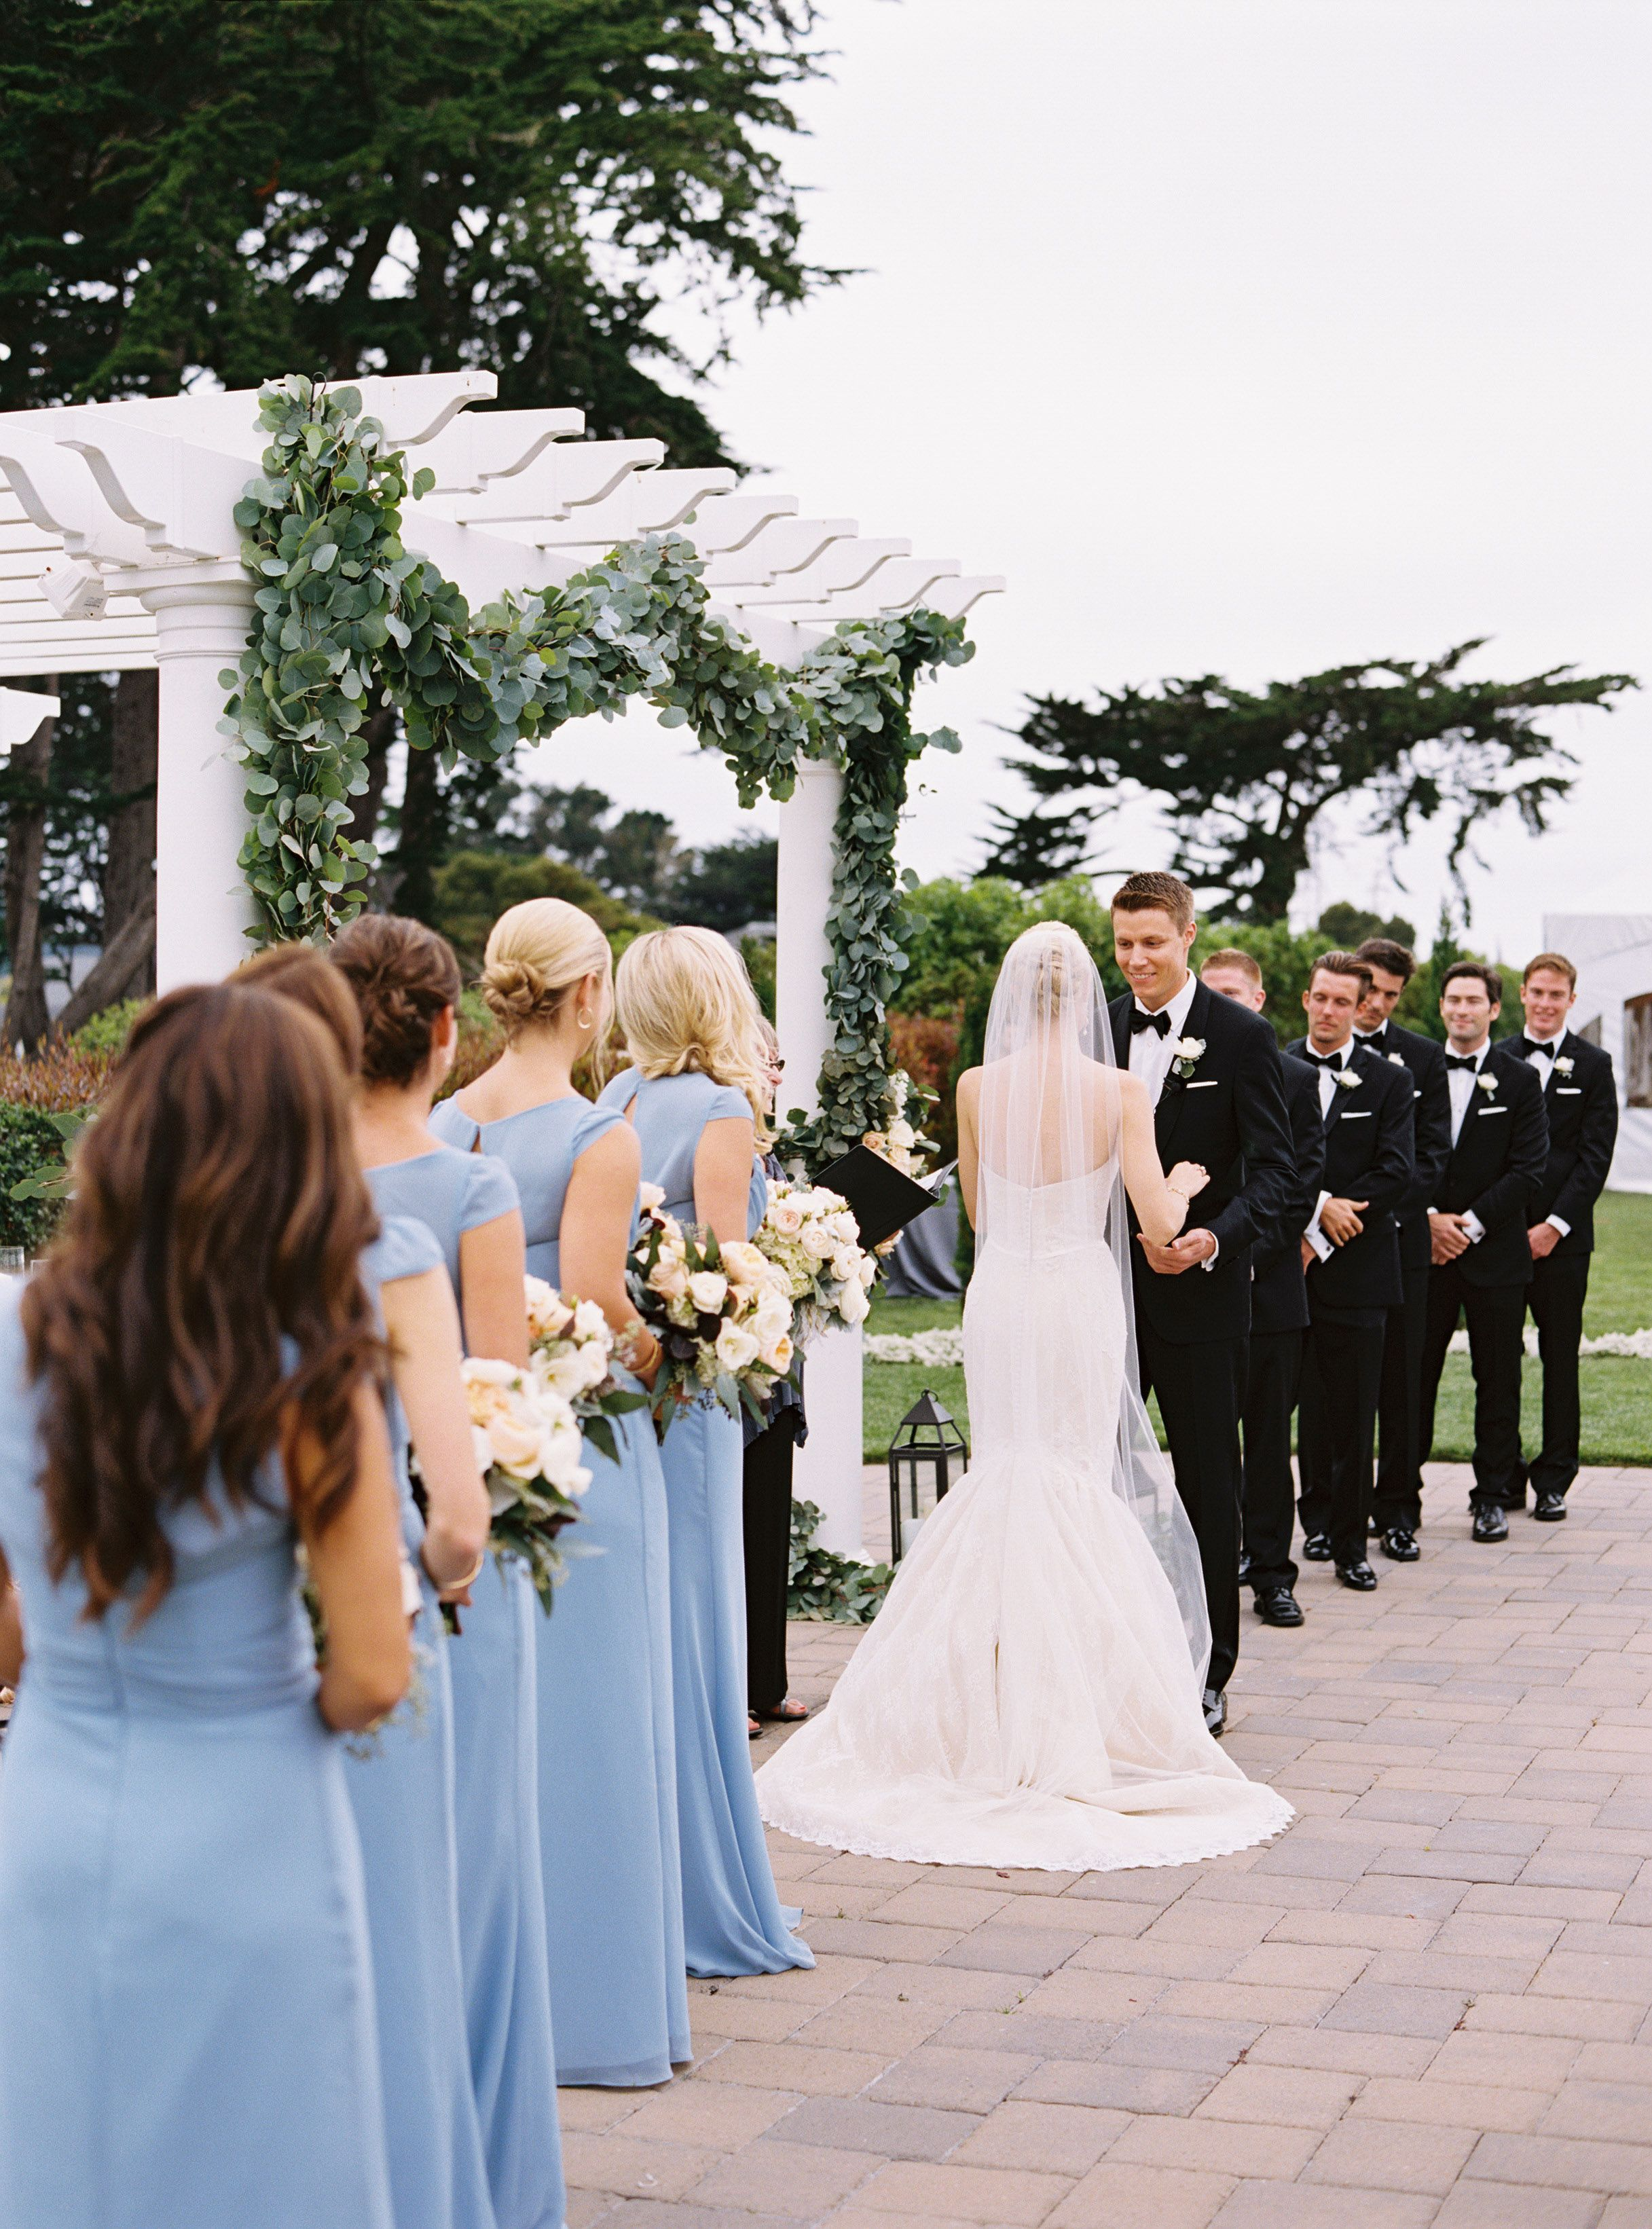 Photography : Jessica Burke   Wedding Dress : Amy Kuschel   Bridesmaids Dresses : Jim Hjelm   Wedding Planner : A Savvy Event, Jill Hinchman Hartnett Read More on SMP: http://www.stylemepretty.com/2015/02/19/elegant-coastal-wedding-at-half-moon-bay/